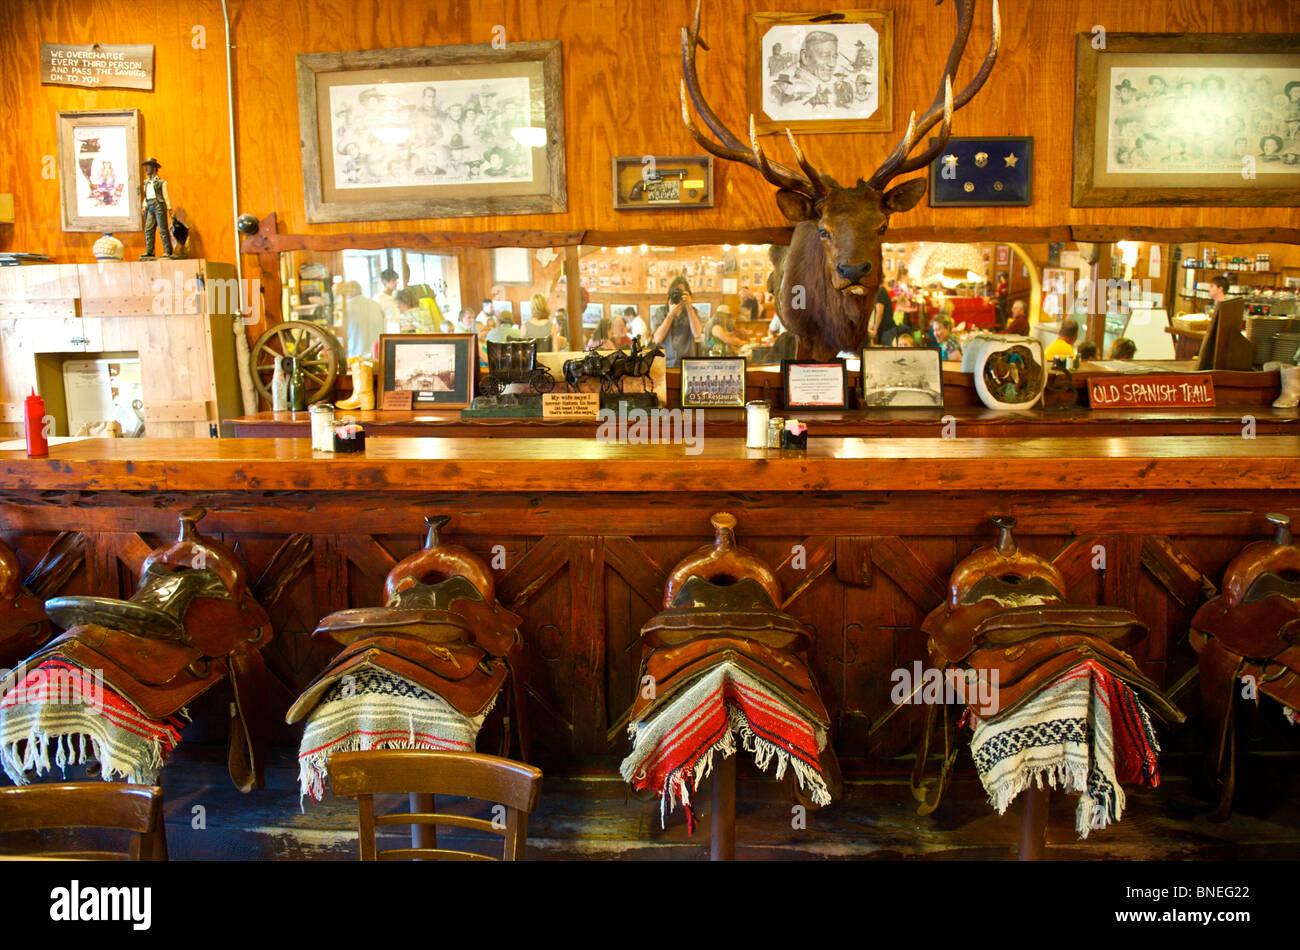 À l'intérieur d'un bar espagnol Bandera, Hill Country, Texas, États-Unis Banque D'Images